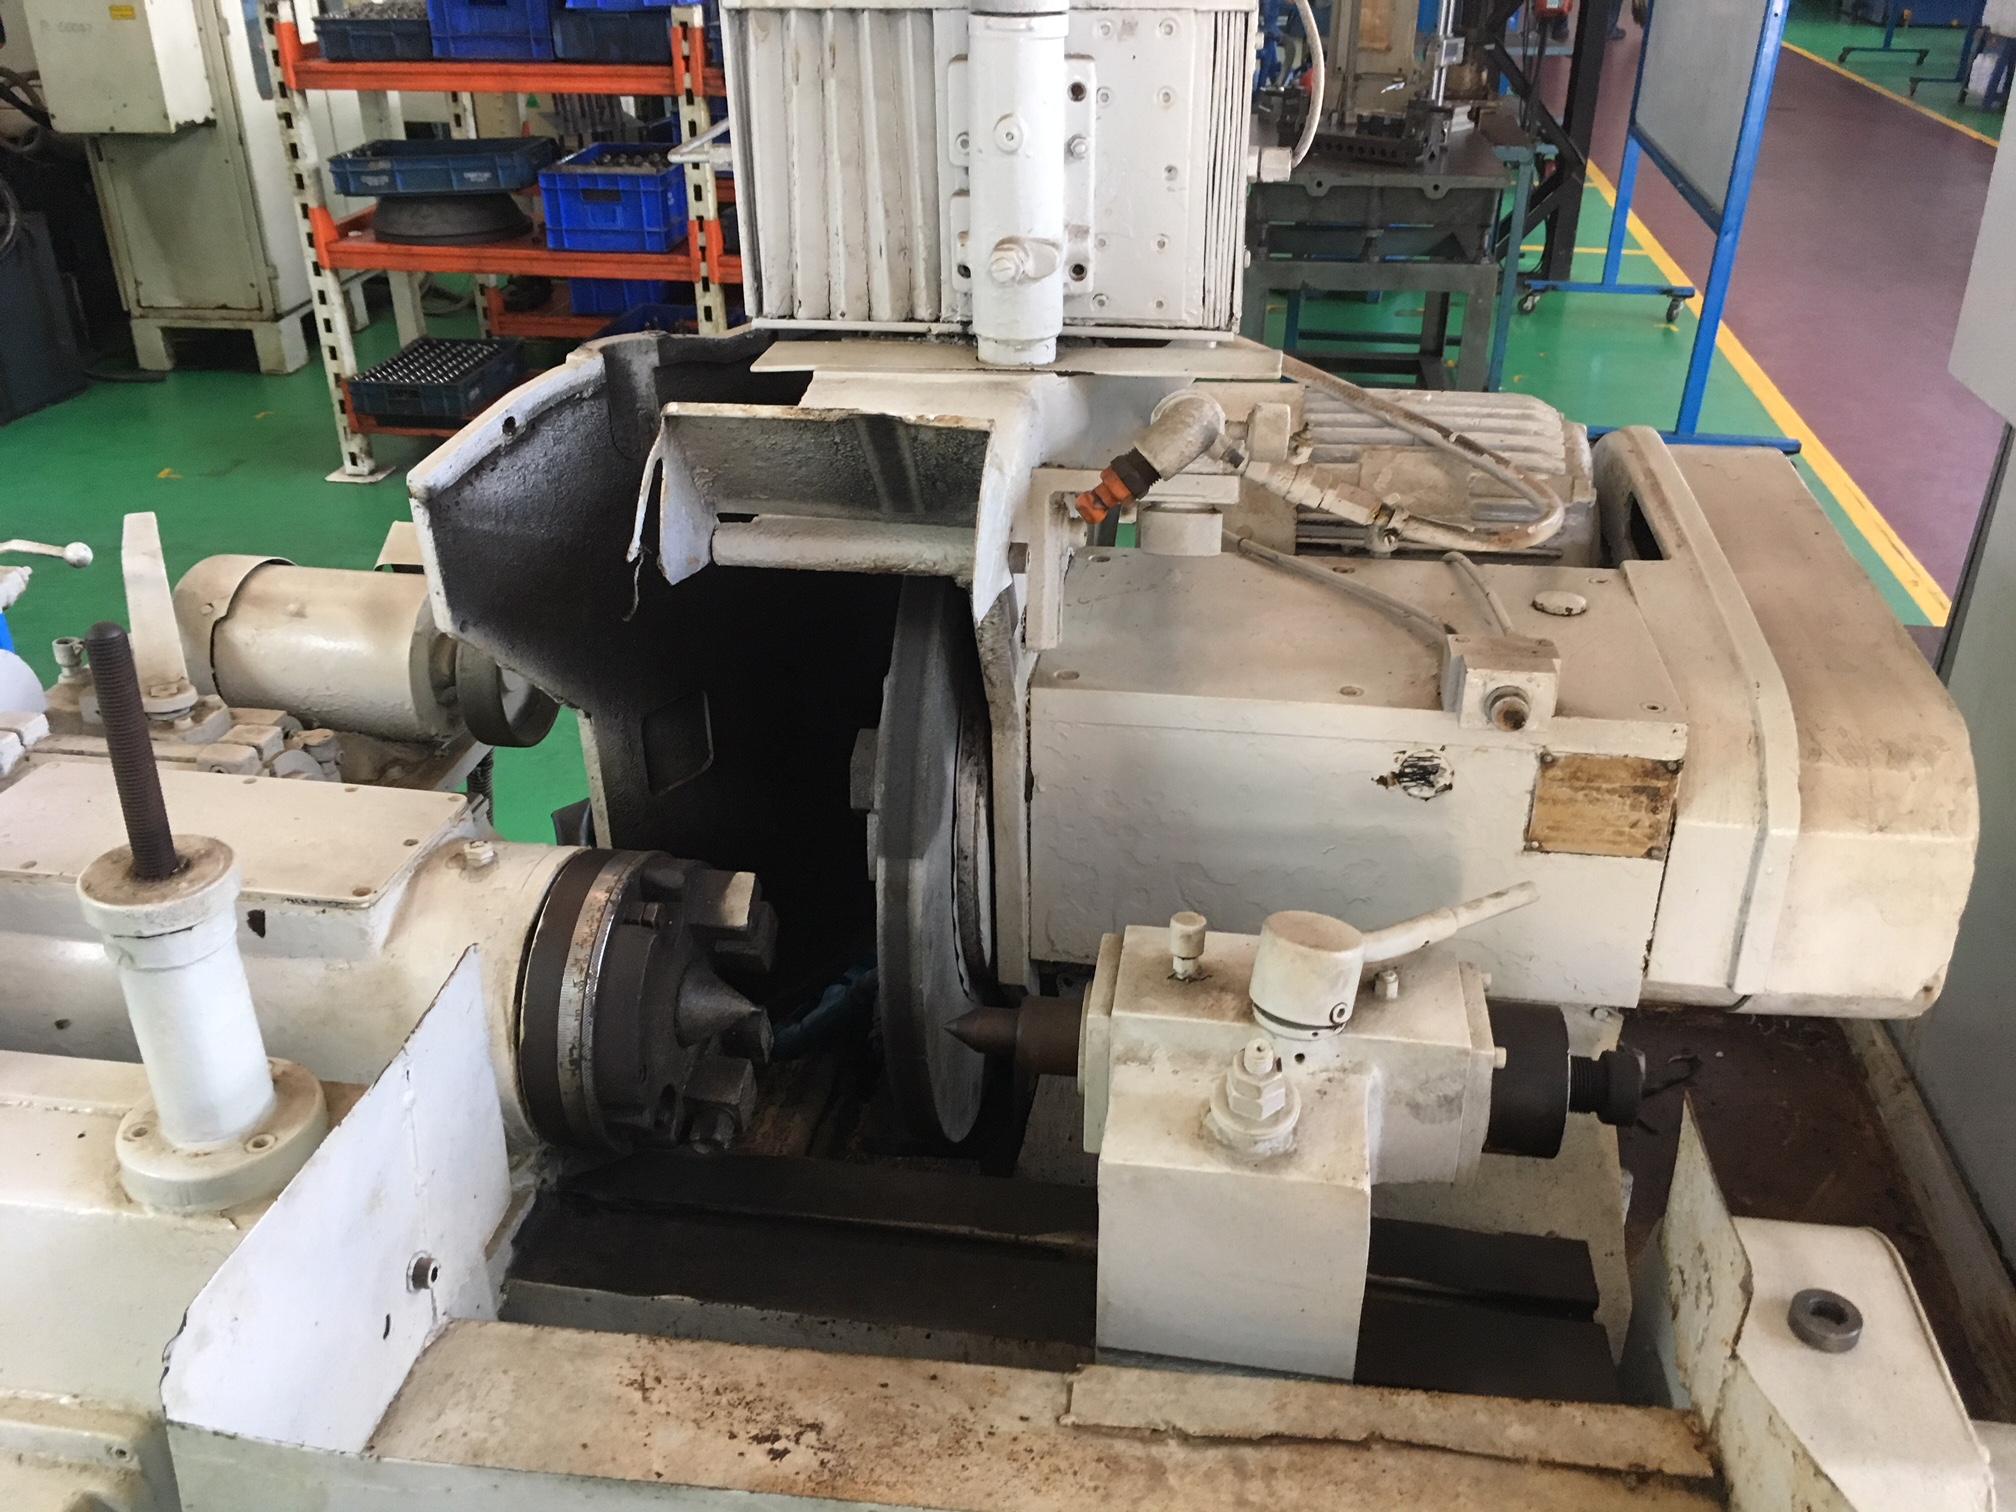 Minakuchi HG-0-200N CAM Grinding Machine